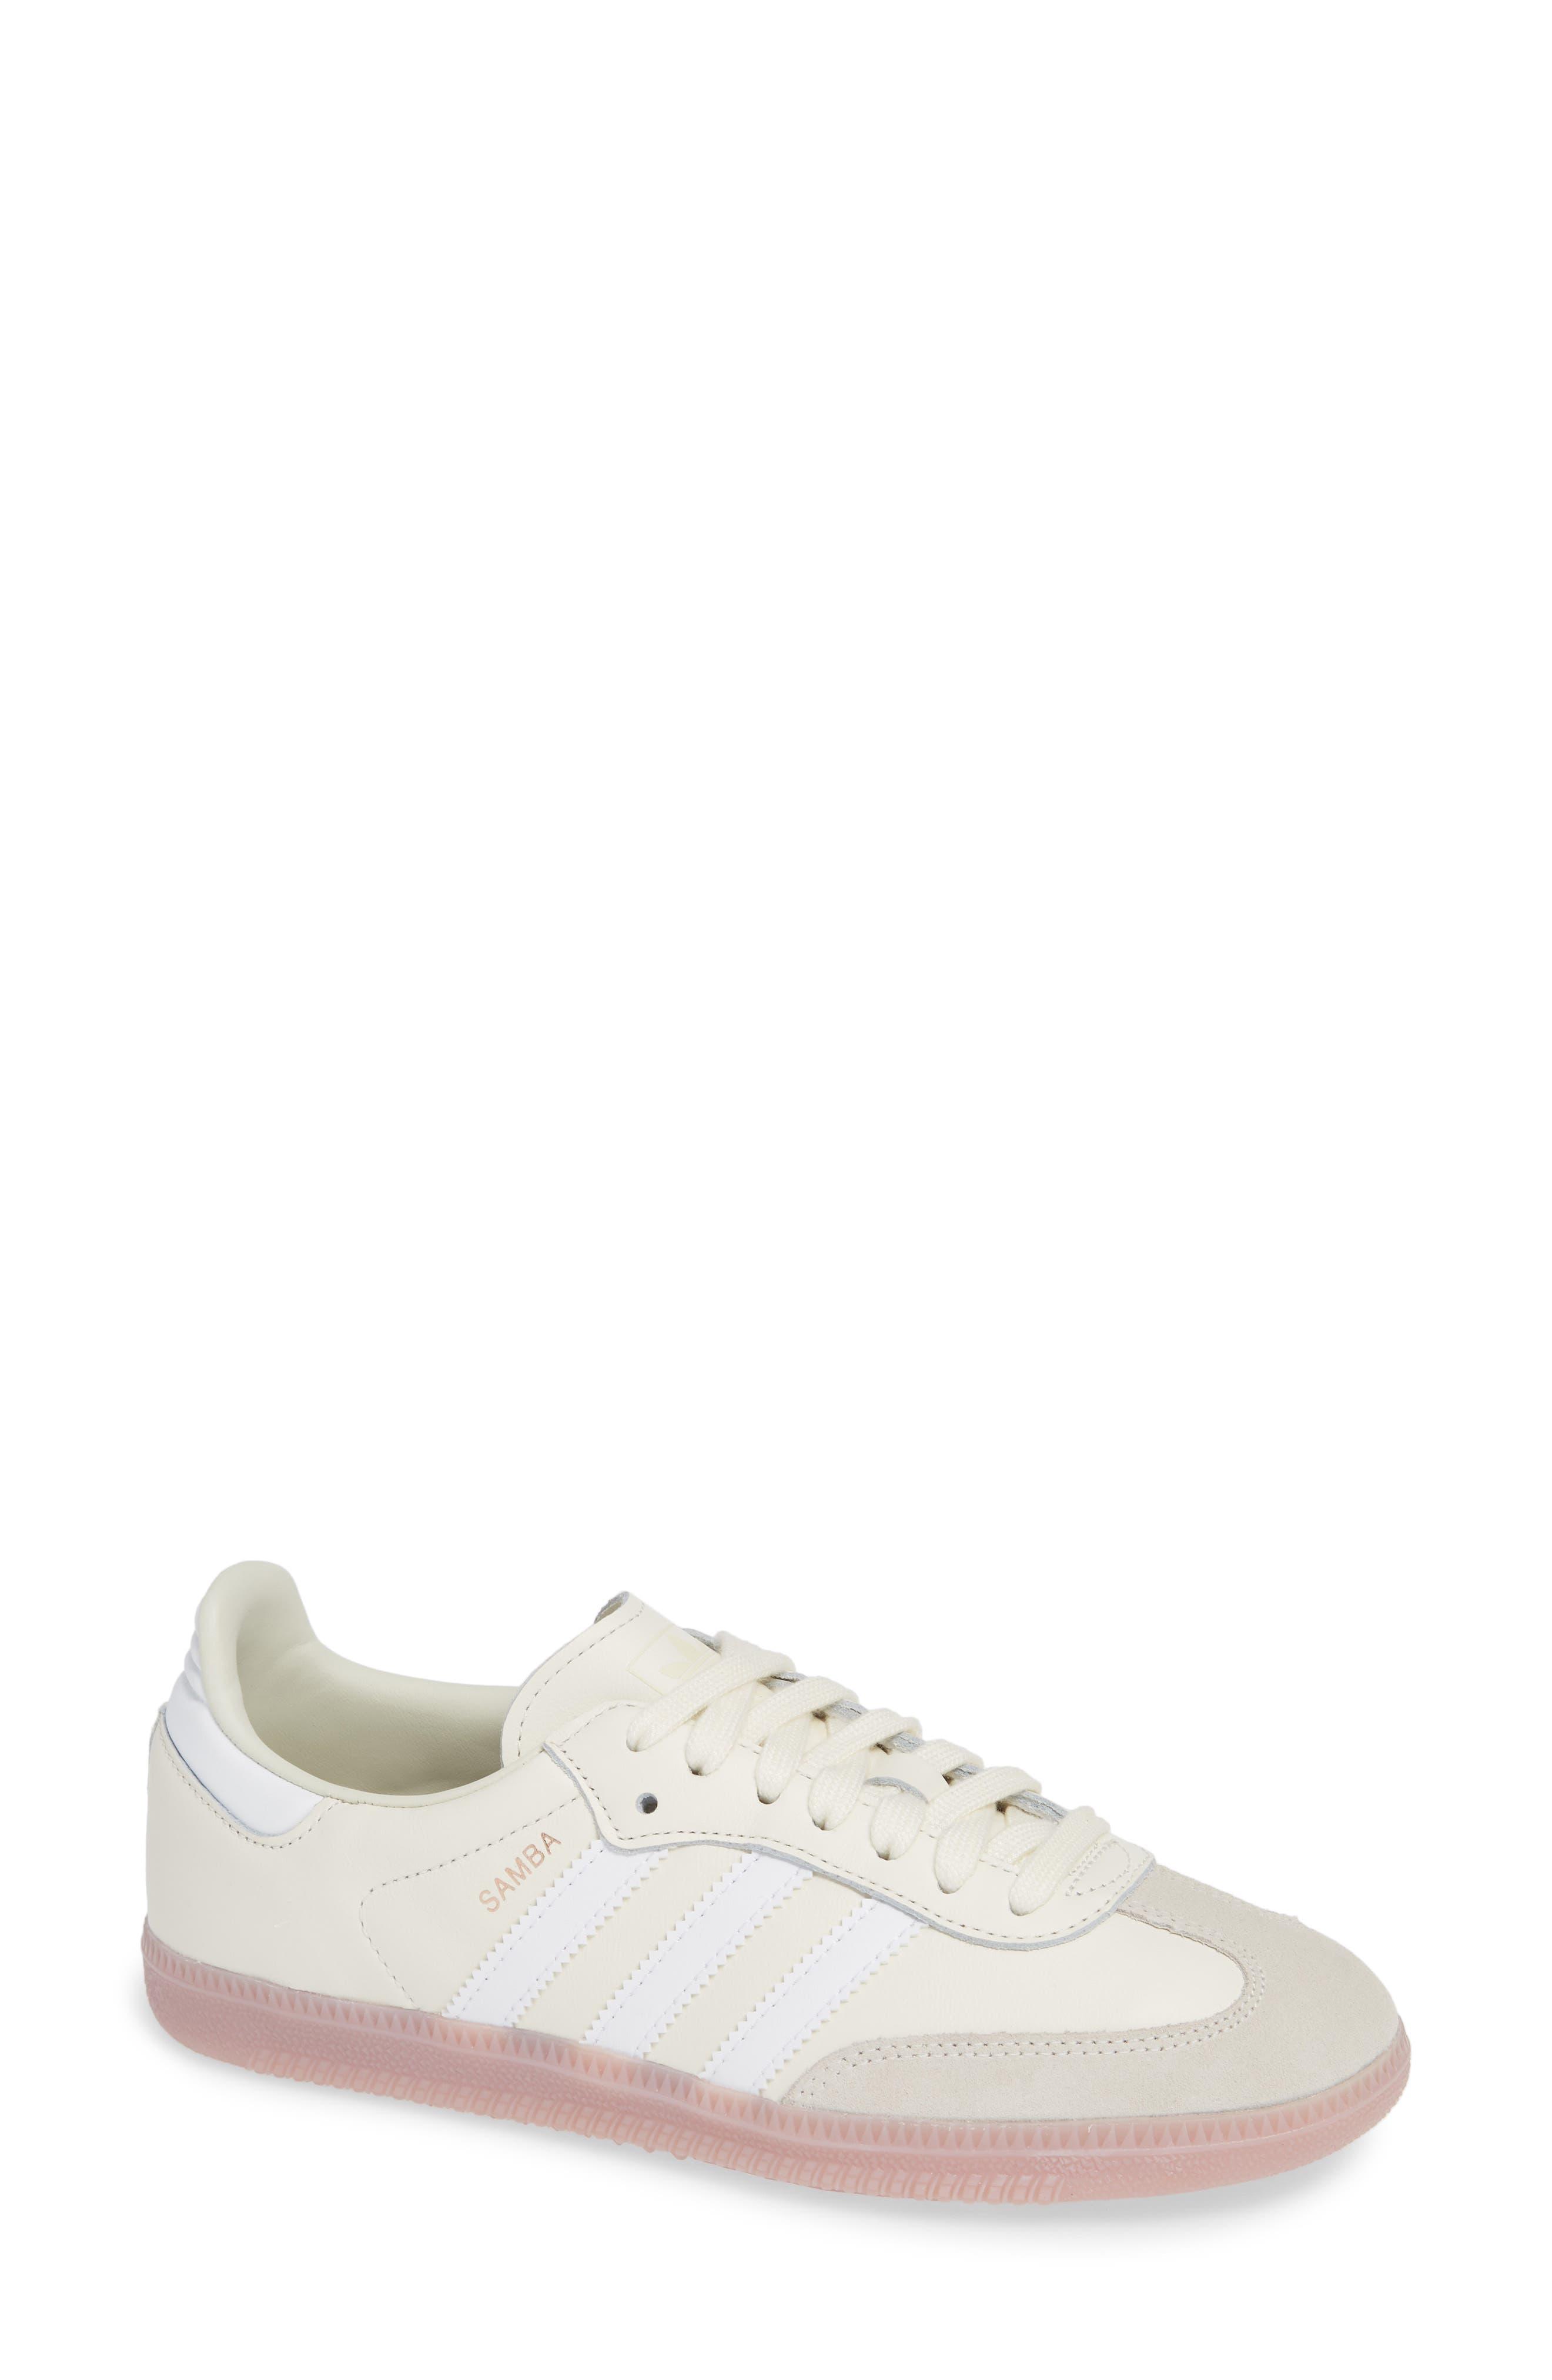 Samba Sneaker,                             Main thumbnail 1, color,                             OFF WHITE/ WHITE/ SOFT VISION